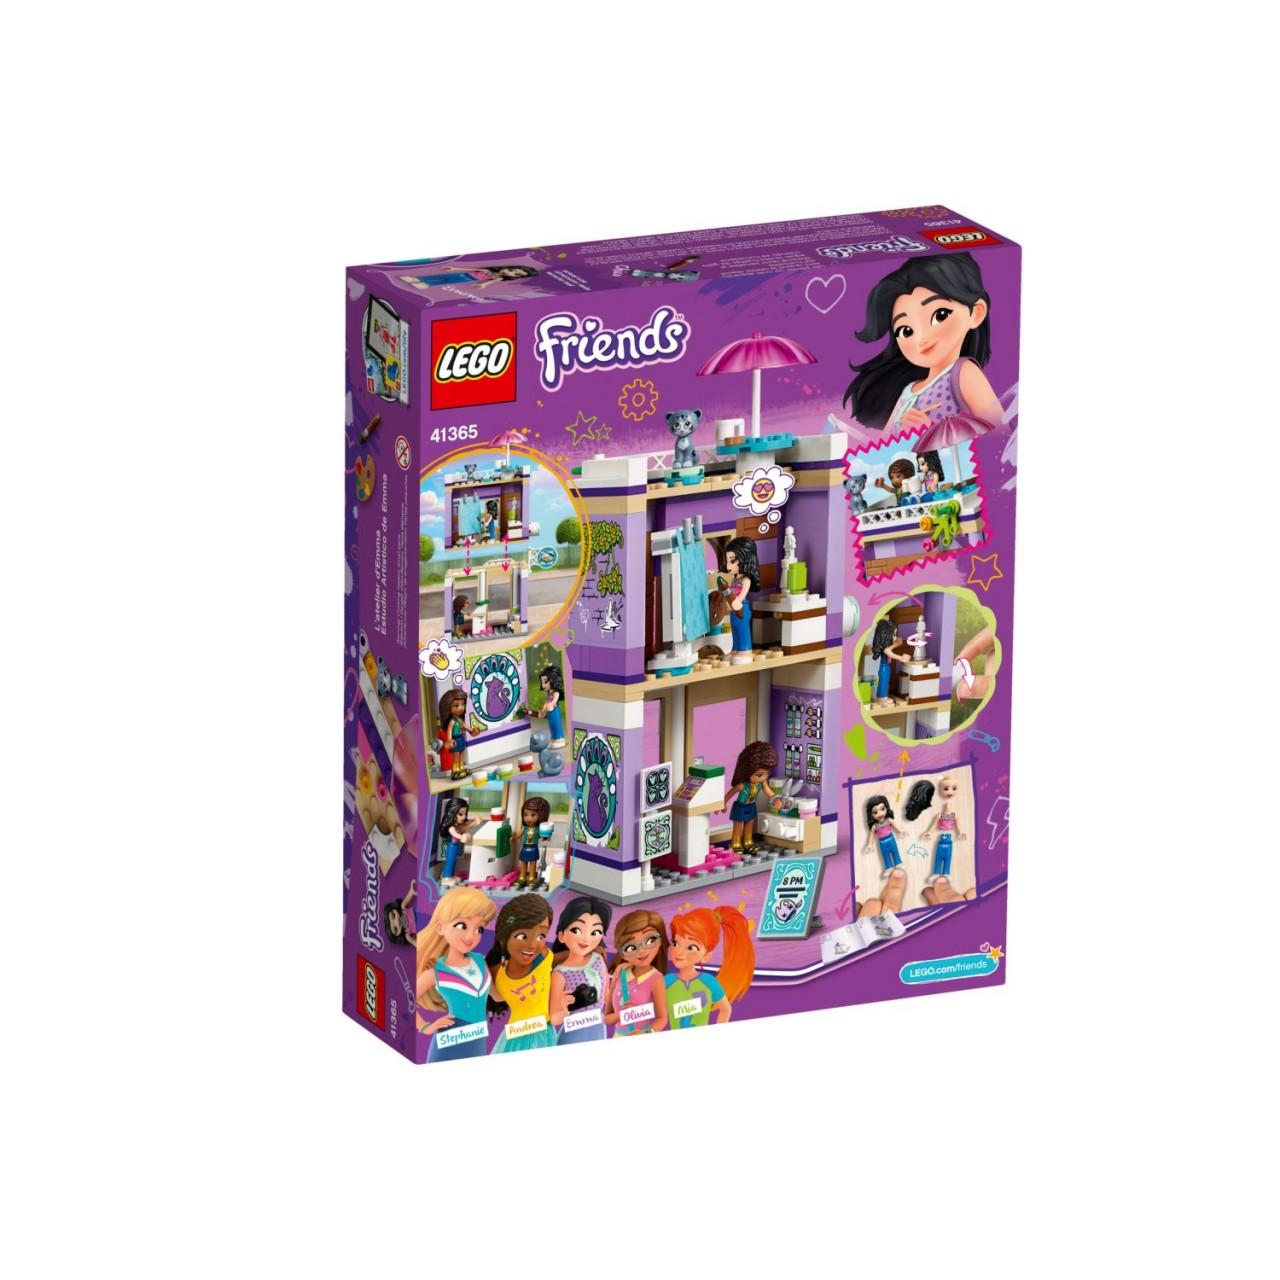 LEGO FRIENDS 41365 Emmas Künstlerstudio